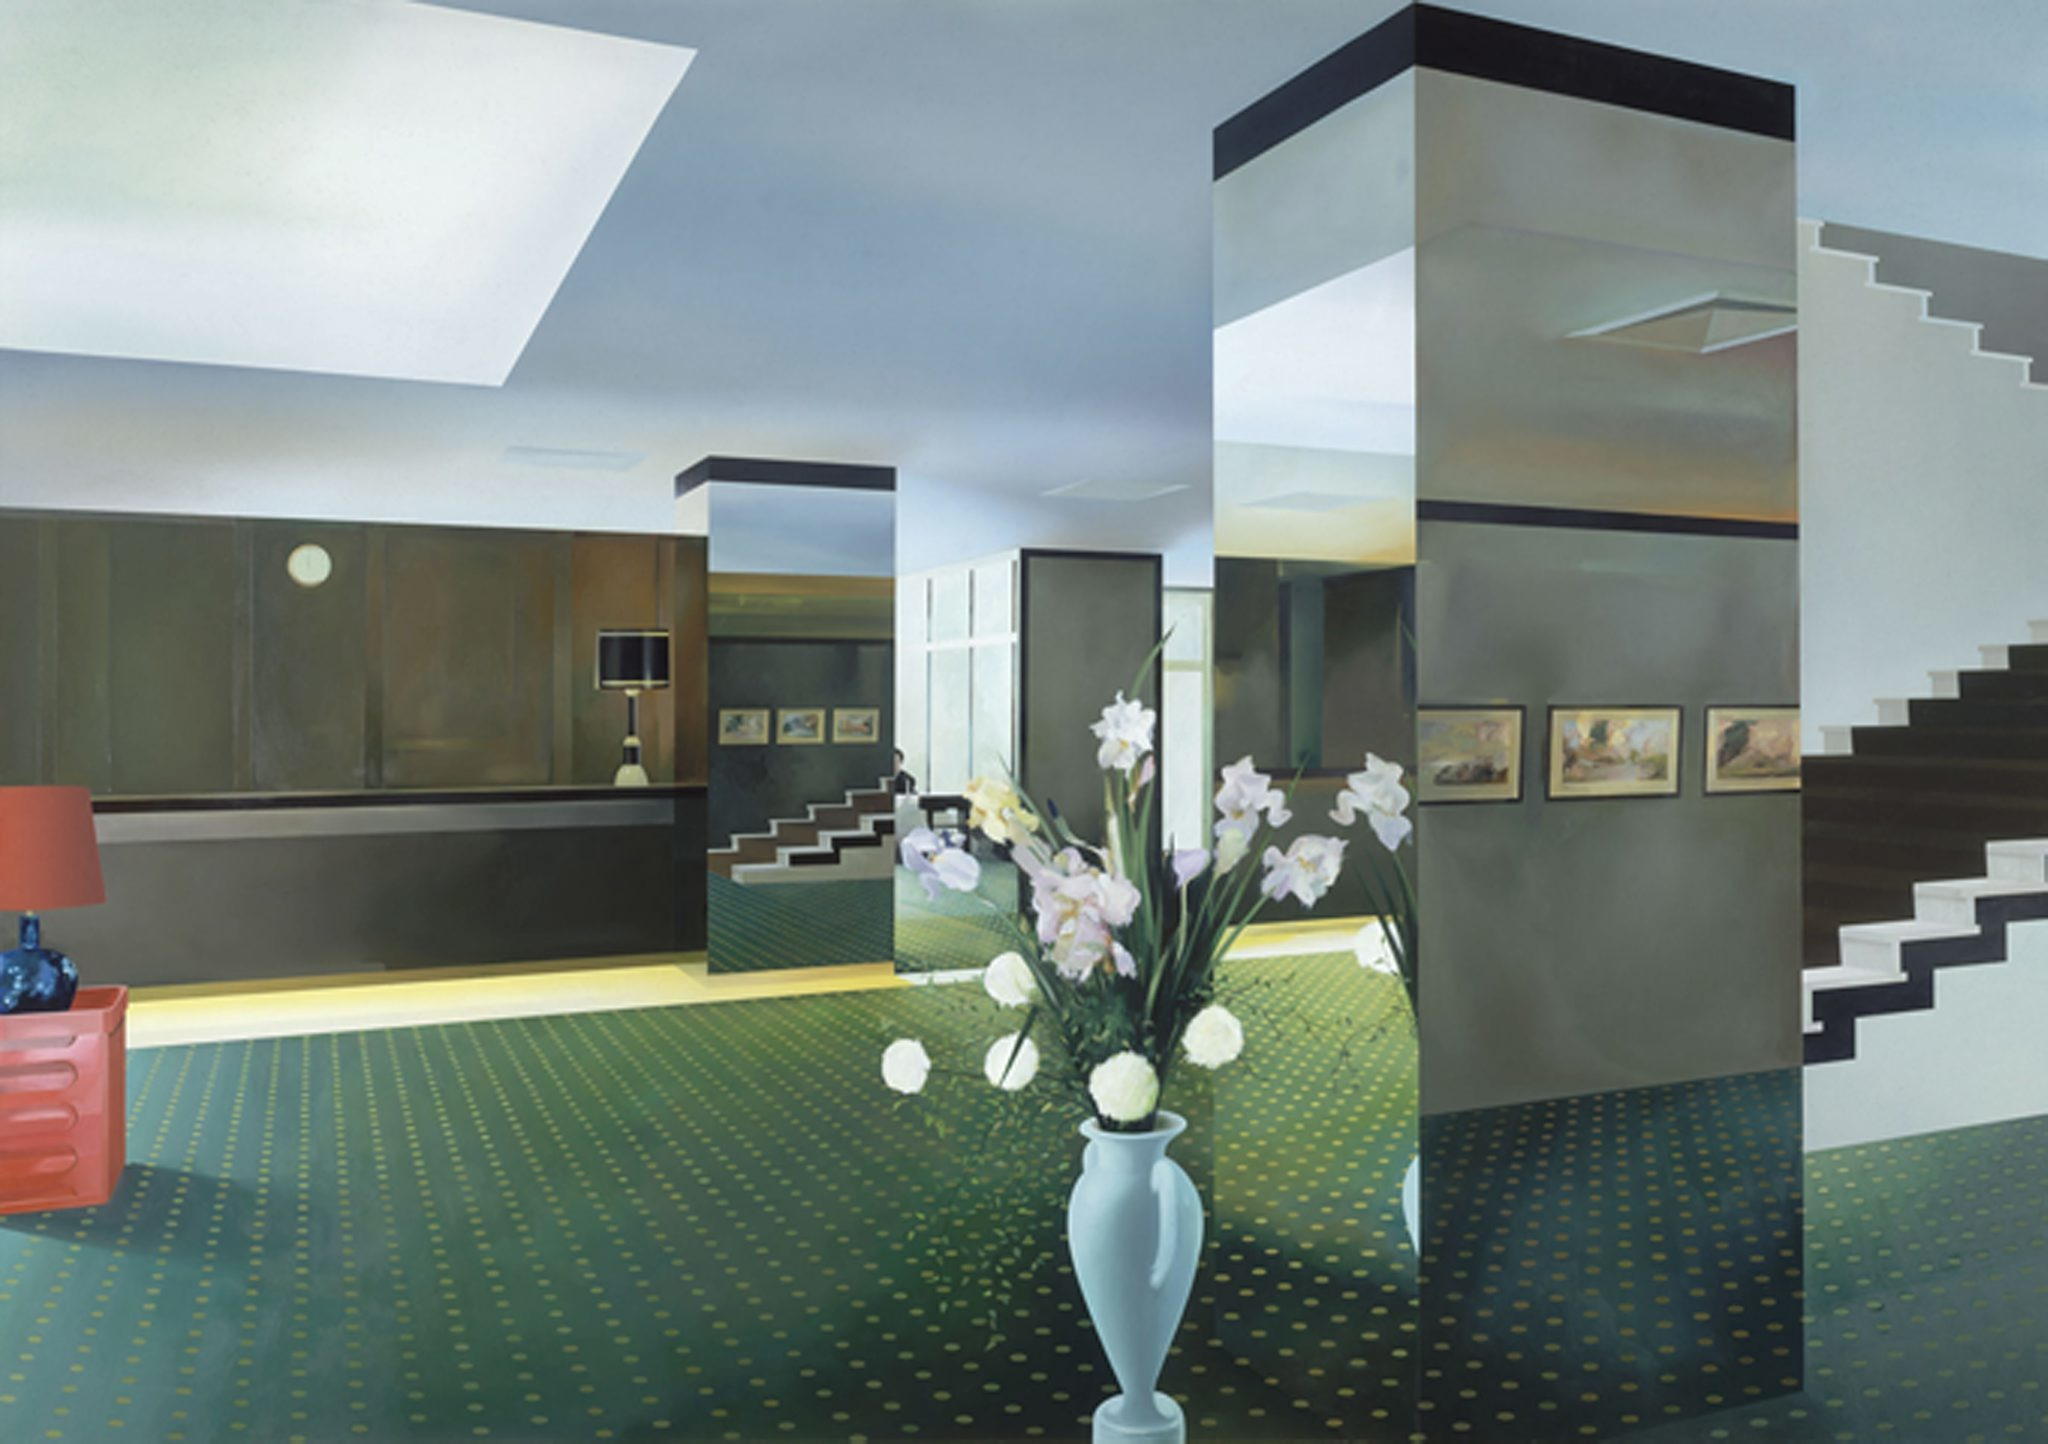 'Lobby' 1985-1987, © the estate of Richard Hamilton